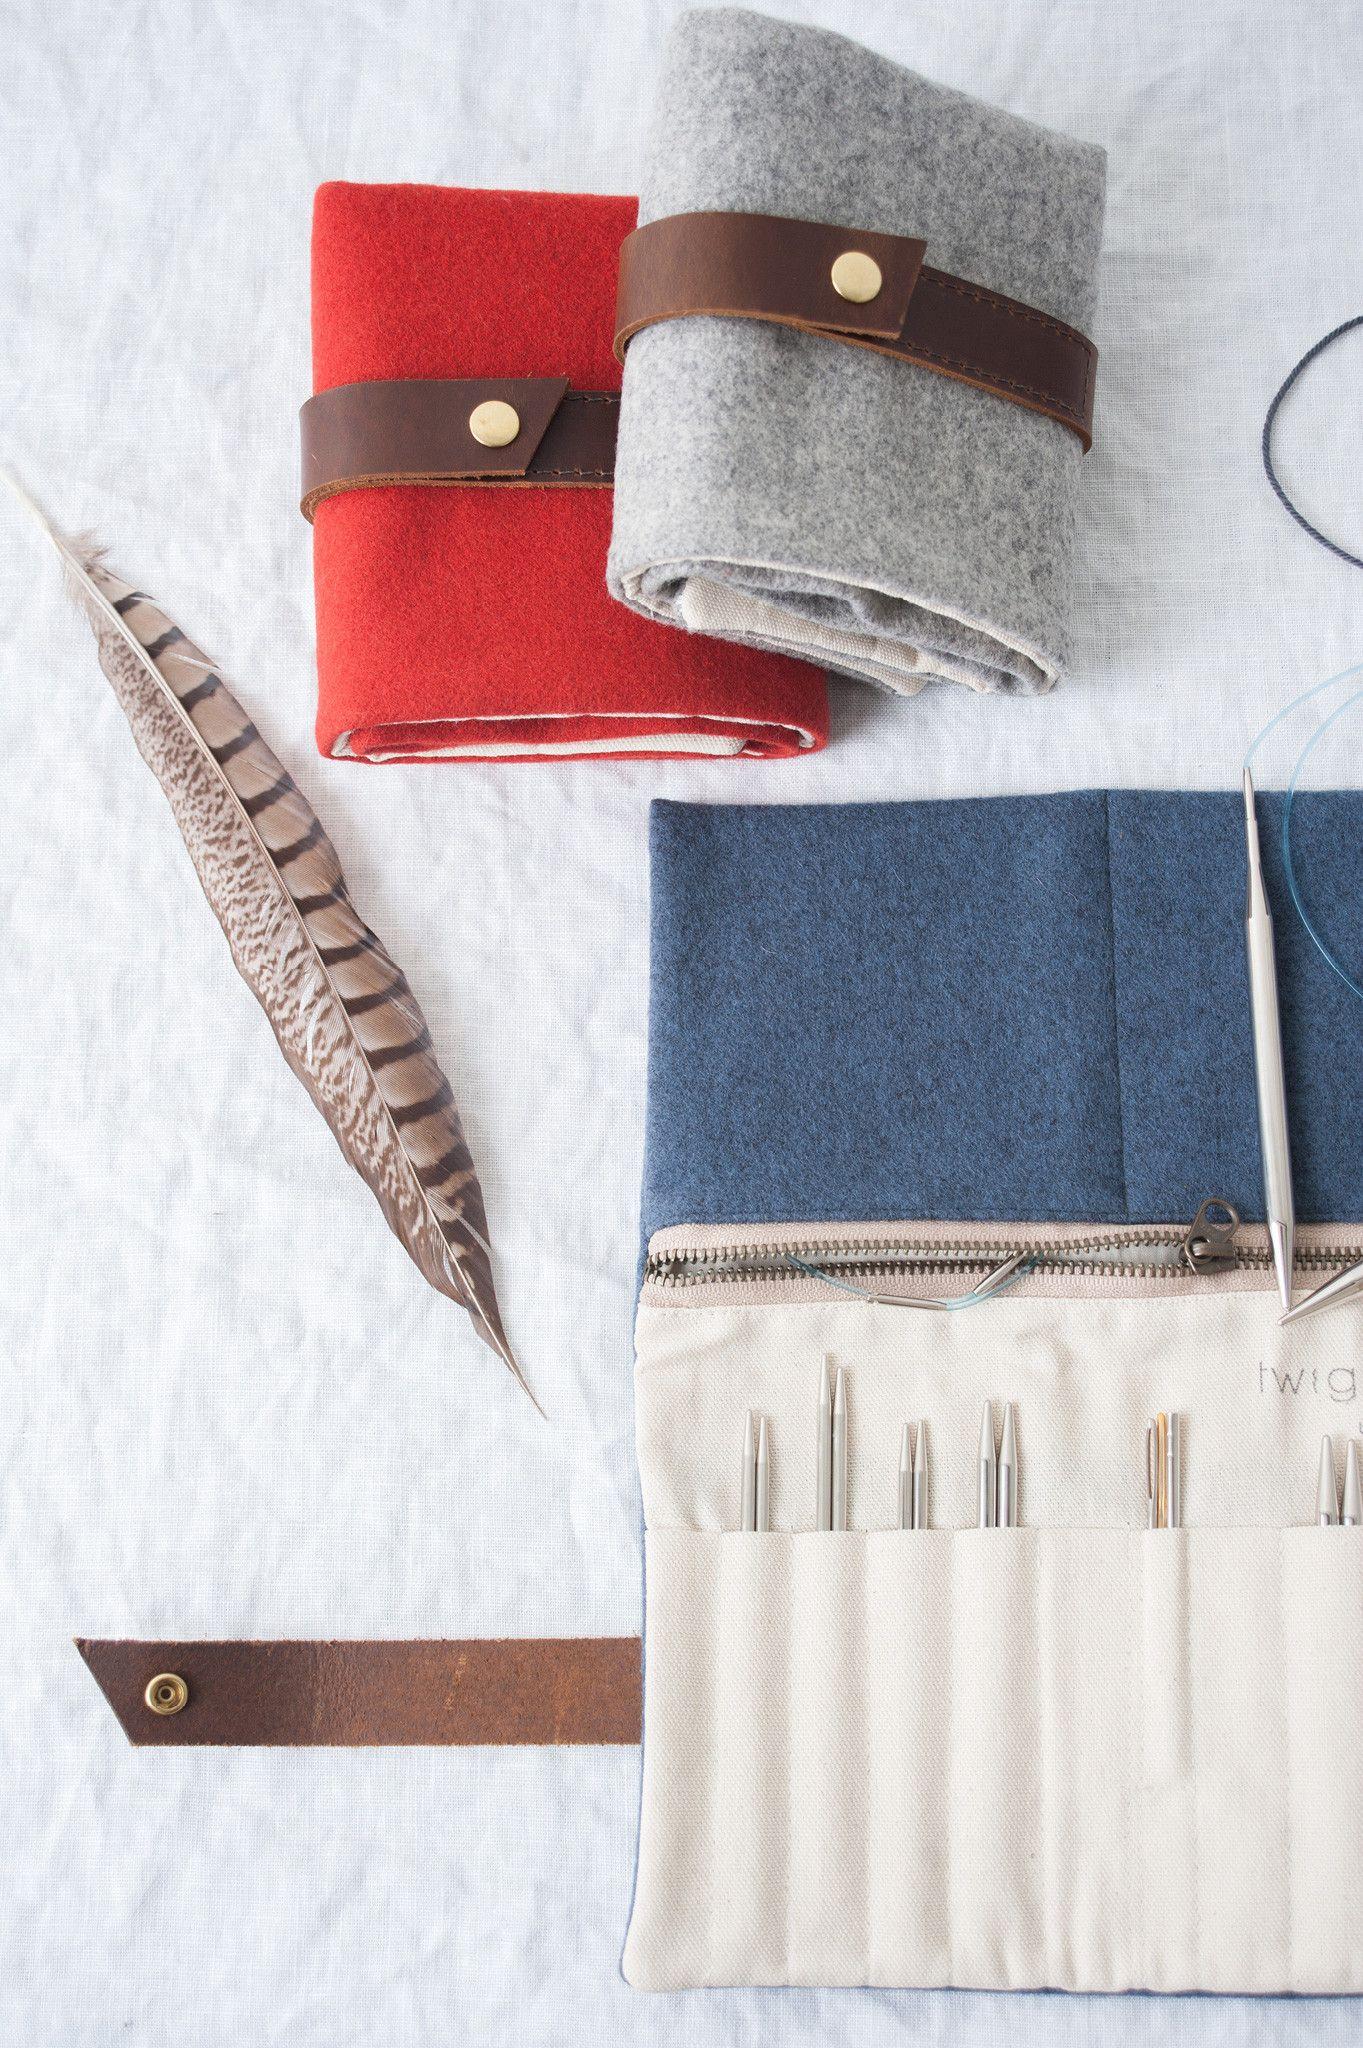 interchangeable needle case | Knitting needle case, Diy ...